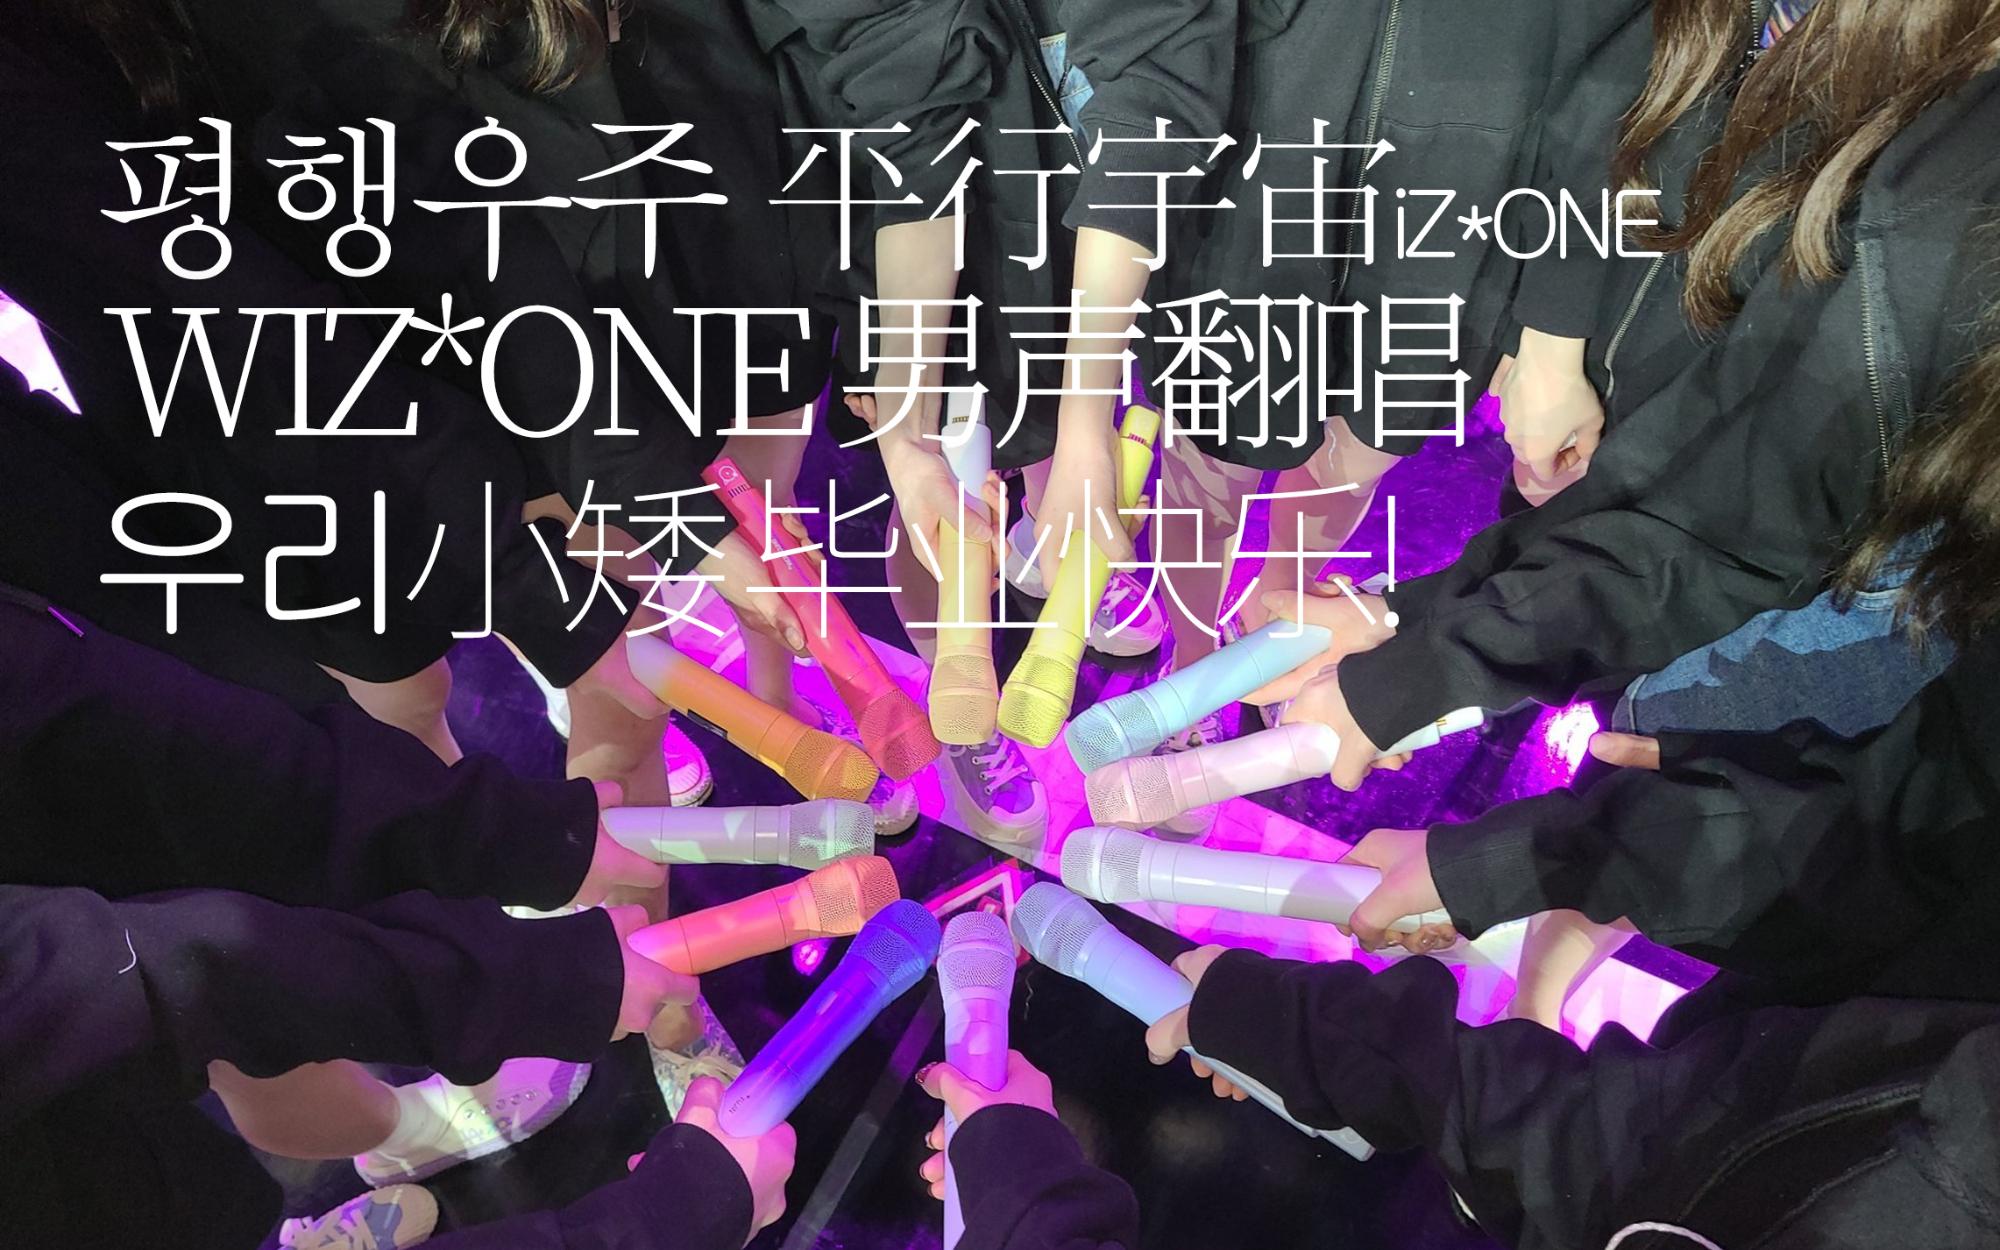 WIZ*ONE催泪男声翻唱《平行宇宙》| 小矮毕业快乐!Cover.iZ*ONE【么羊】